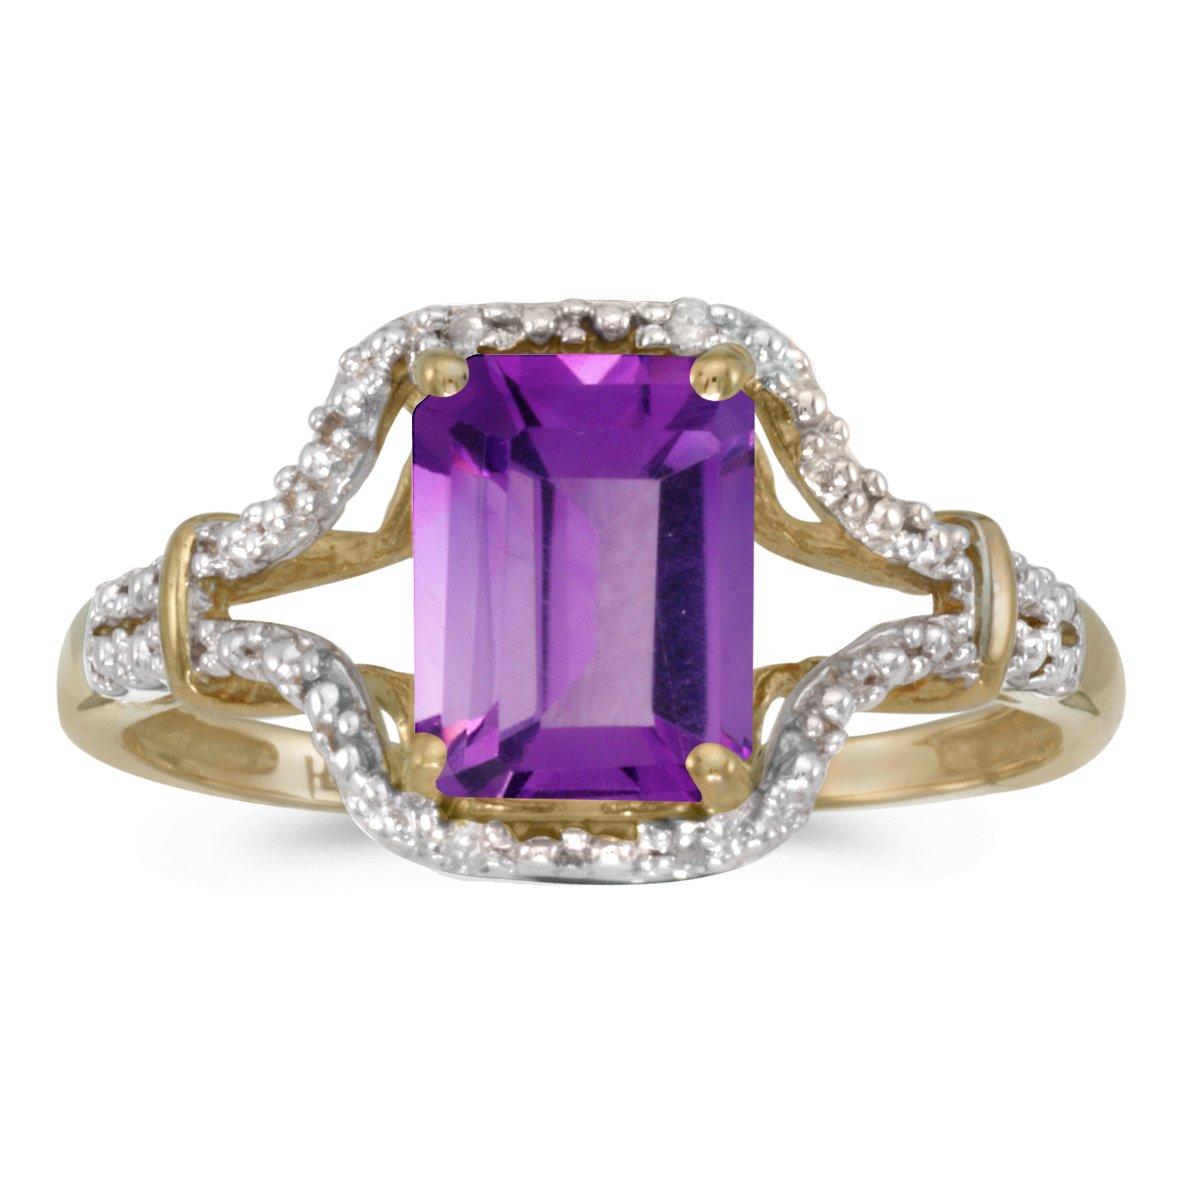 10k Yellow Gold Emerald-cut Amethyst And Diamond Ring (Size 7)